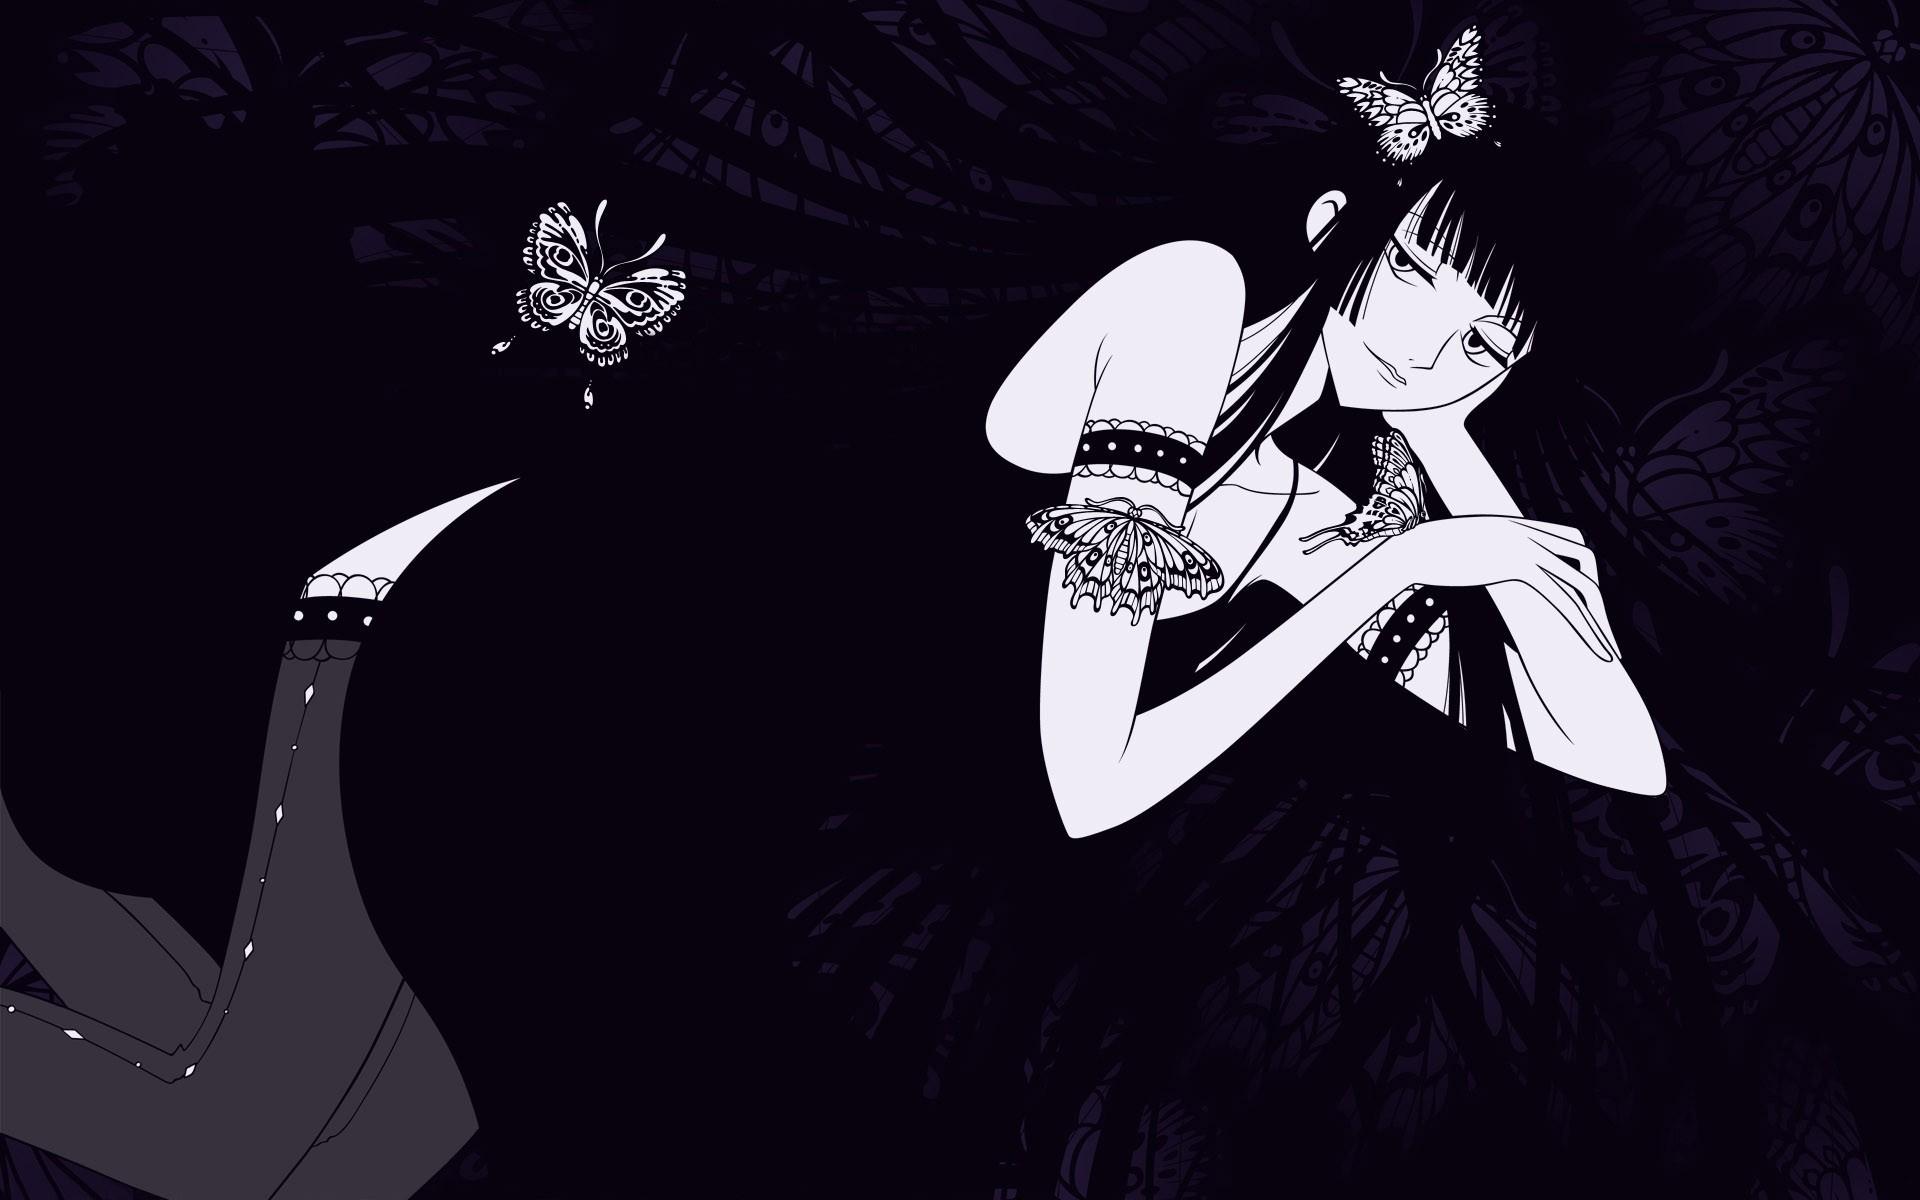 Girls Anime Manga Cartoon HD Wallpaper